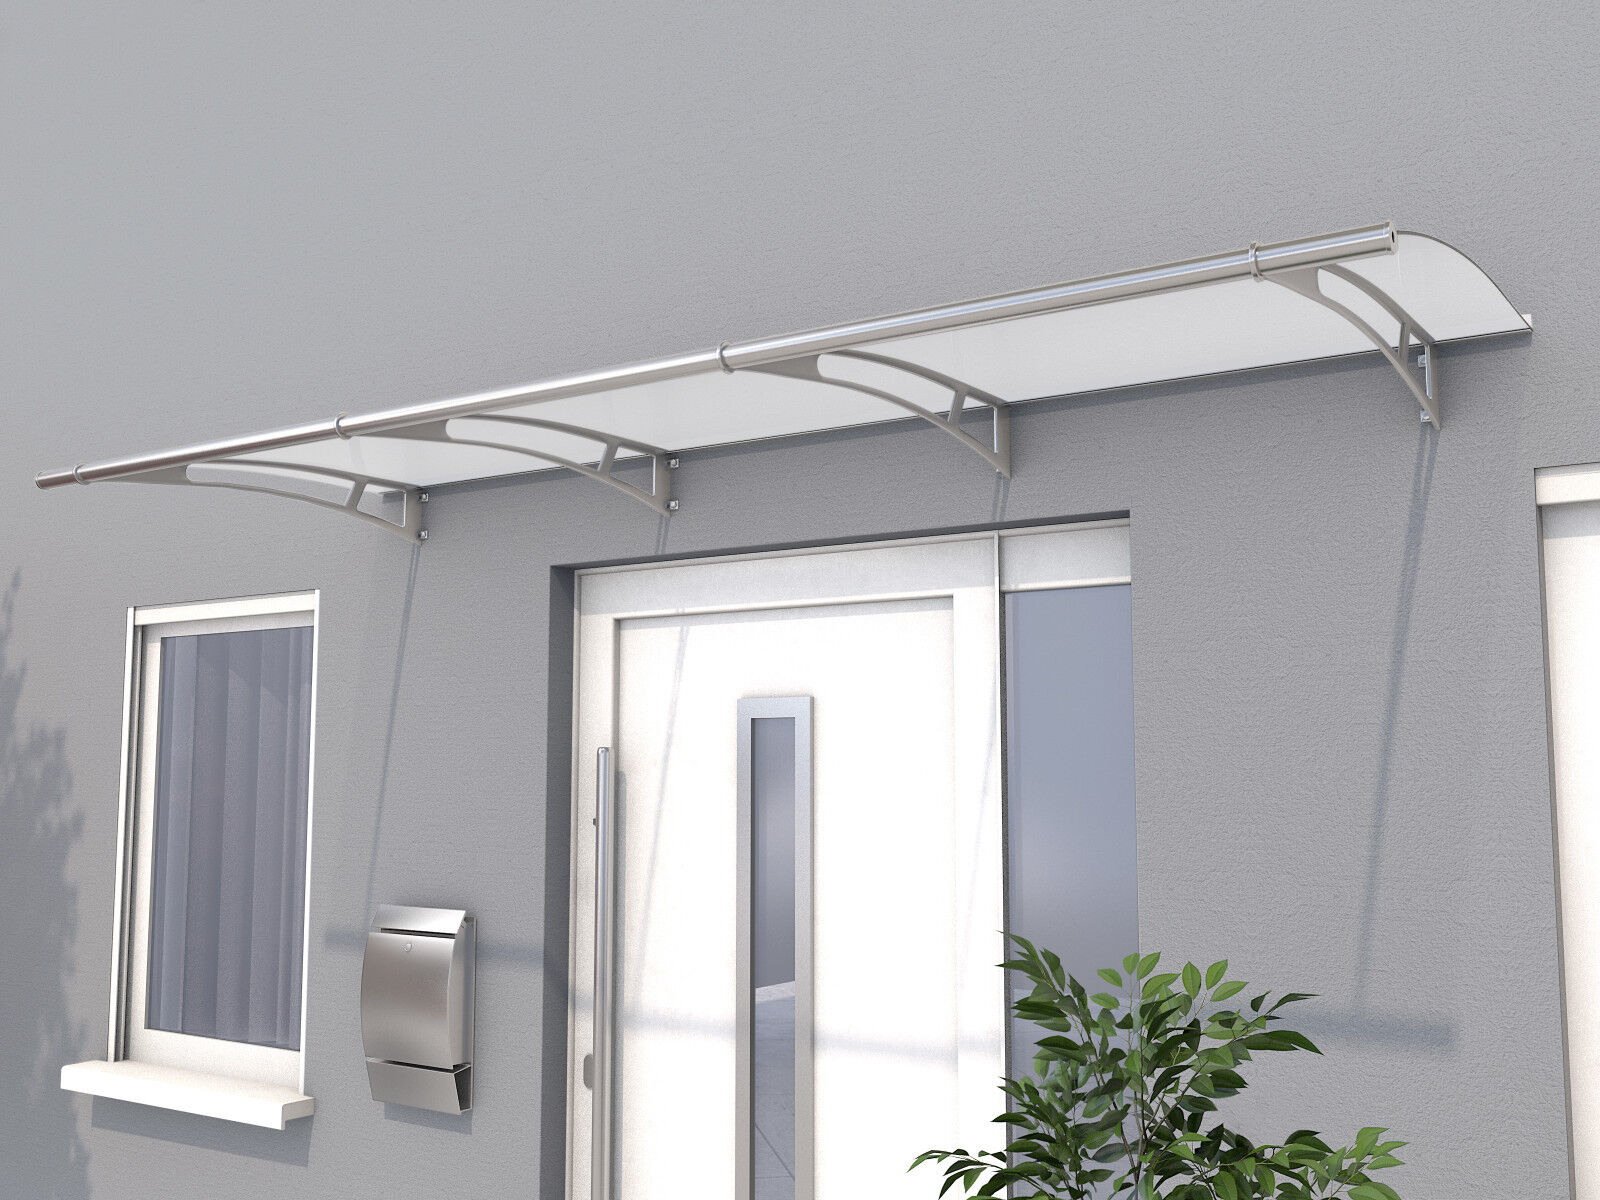 Gutta Pultvordach PT/L 270 satiniert weiß - Haustürvordach 270 x 95 cm Acrylglas